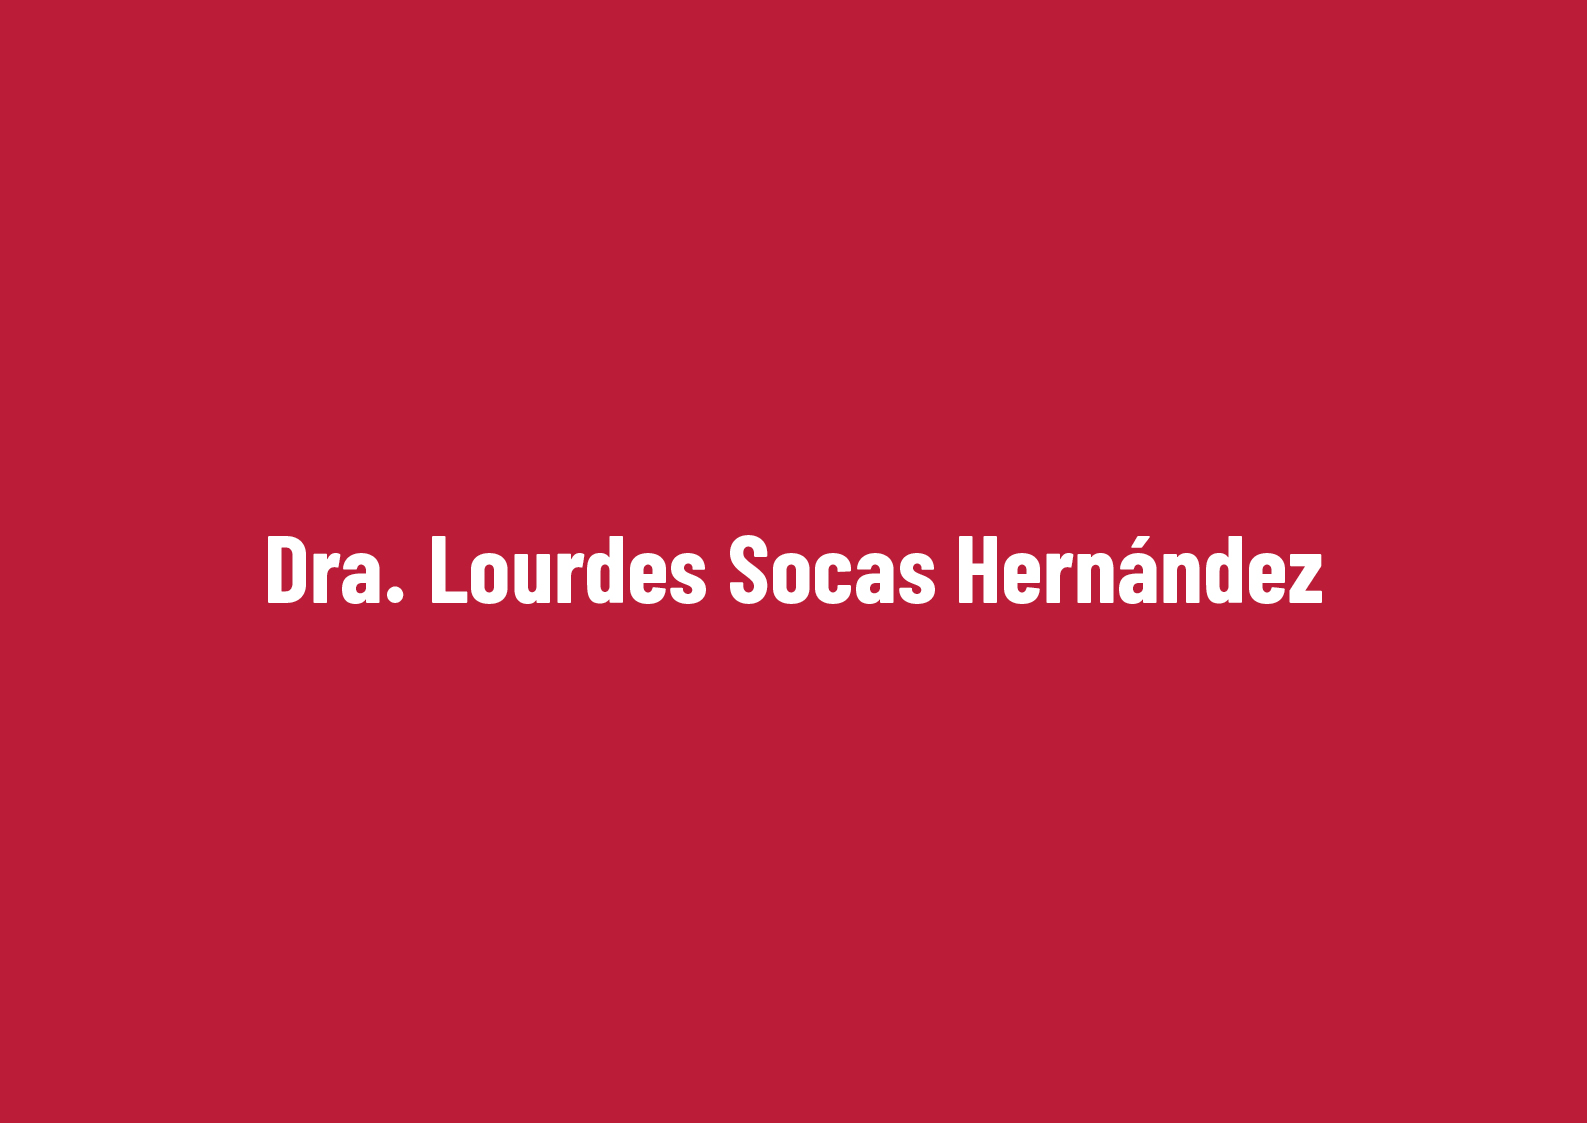 Dra. Lourdes Socas Hernández